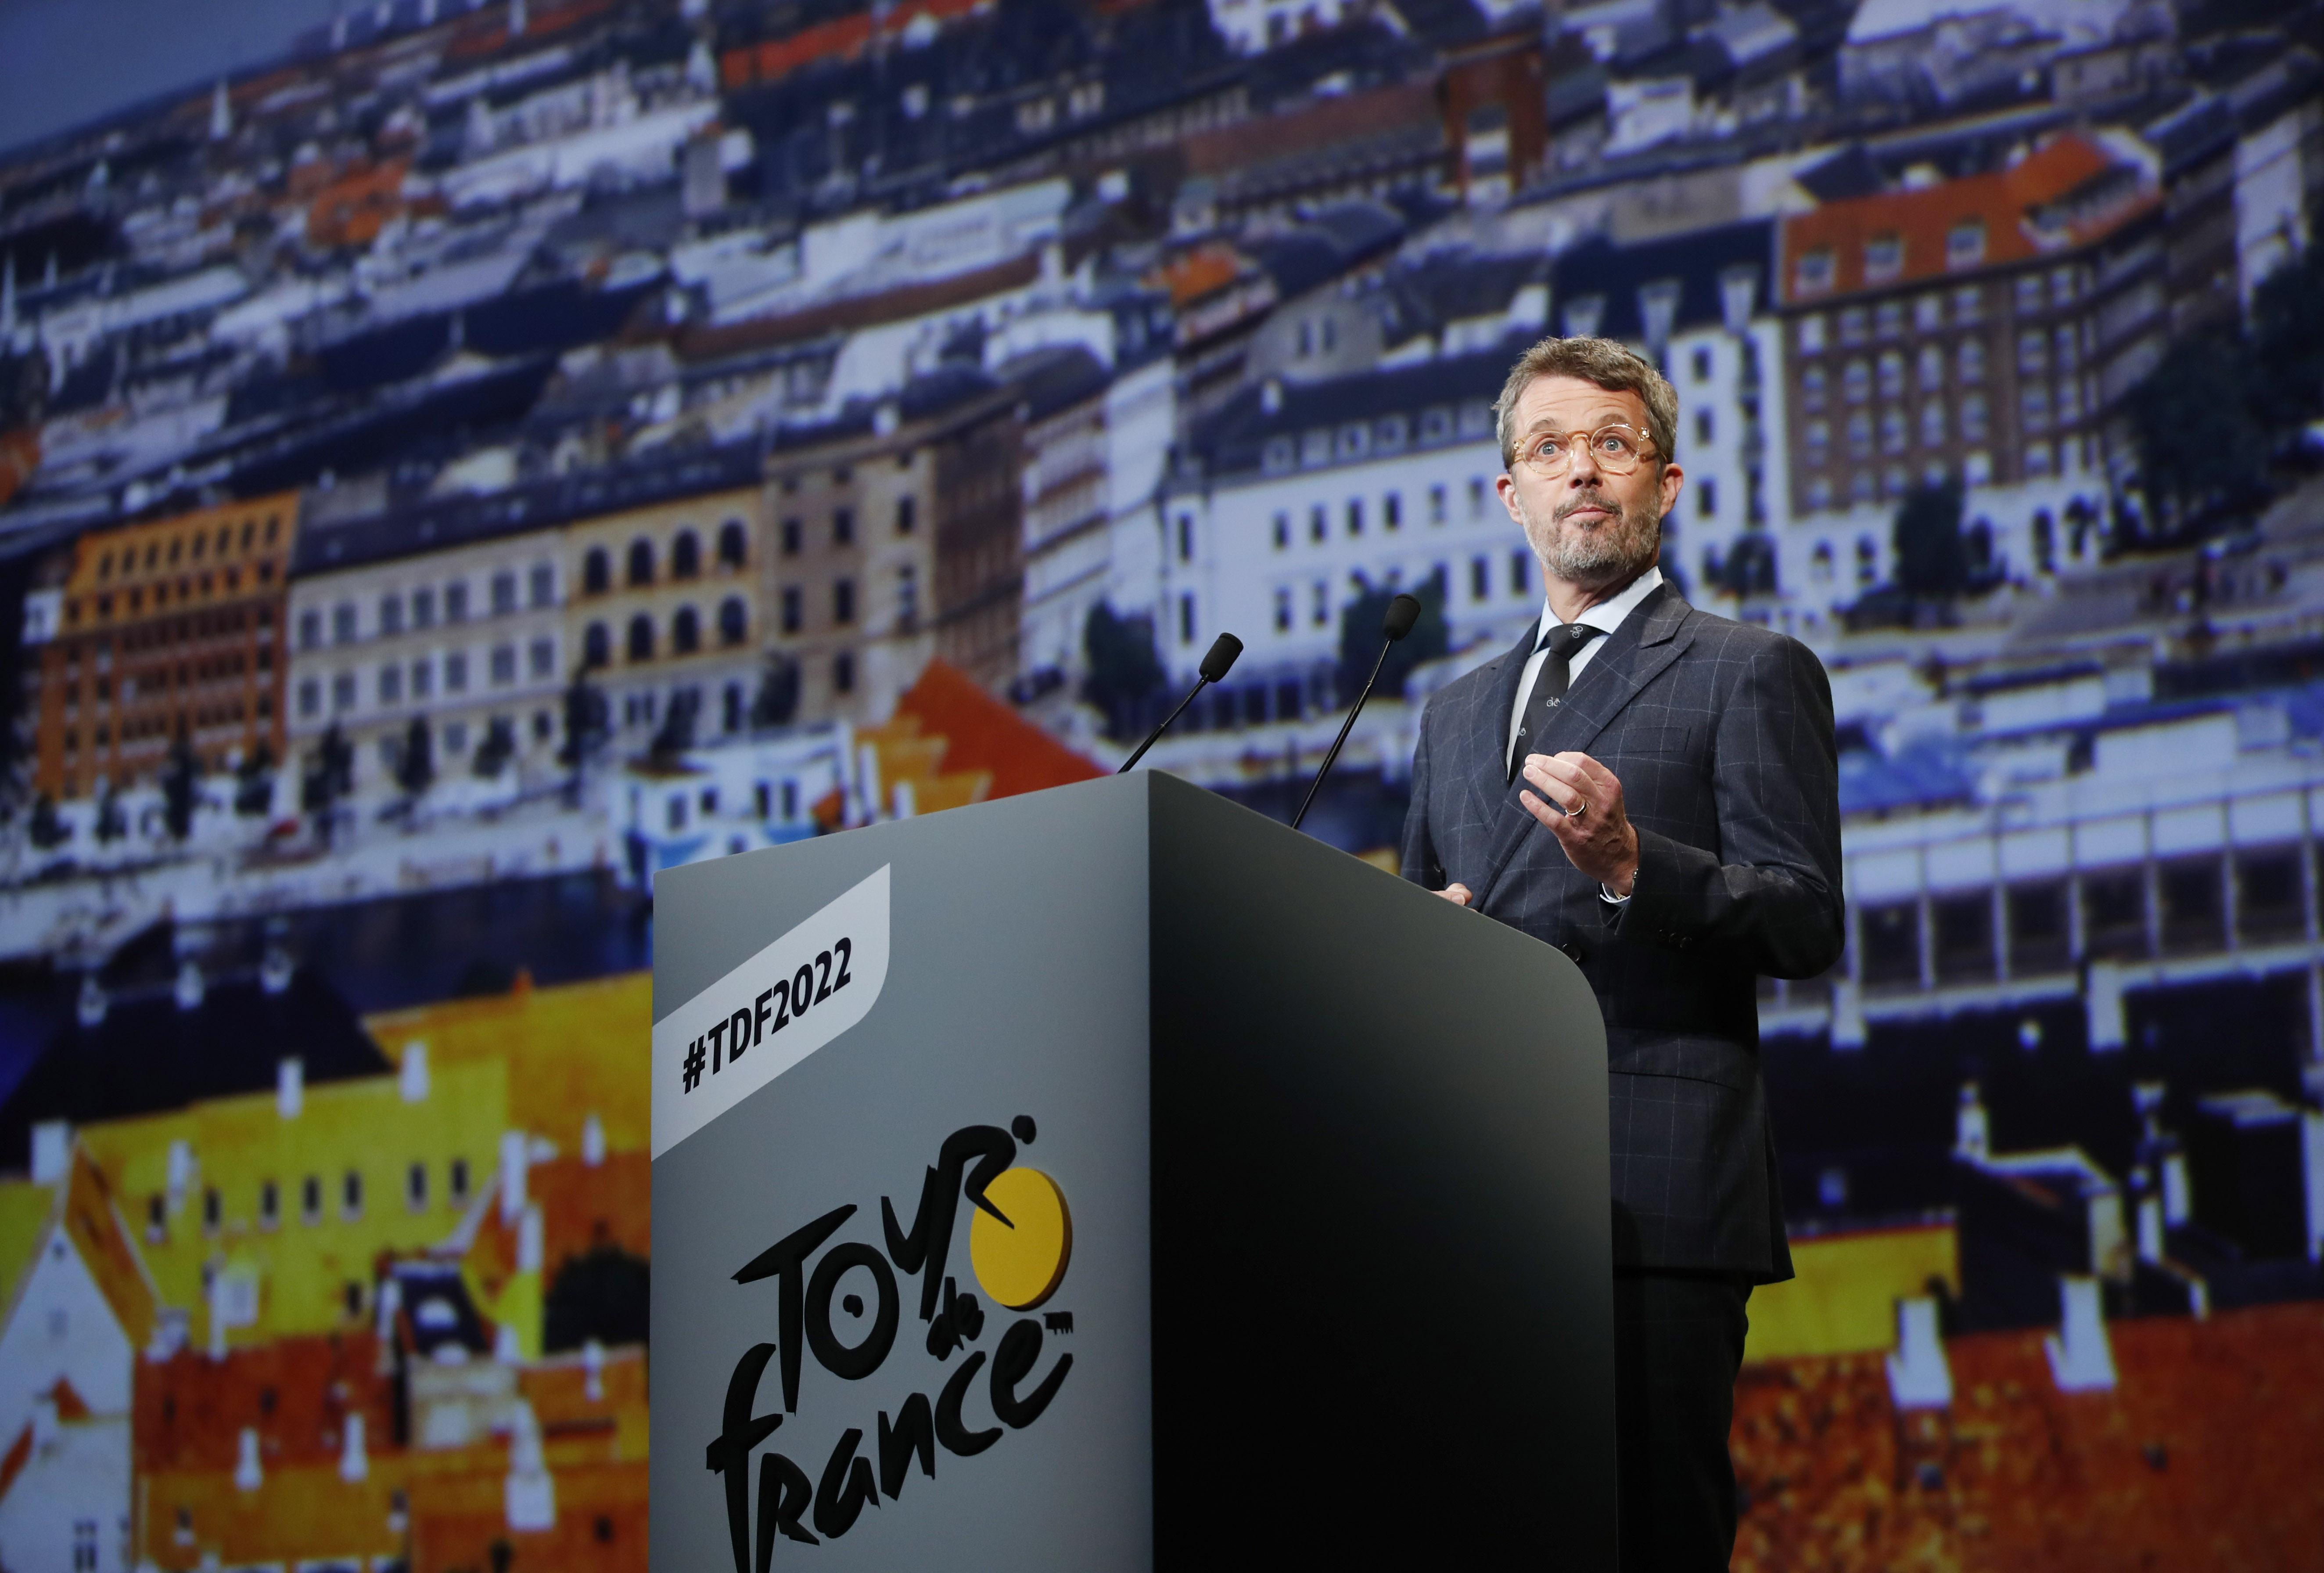 Cycling - 2022 Tour de France Presentation - Palais des Congres, Paris, France - October 14, 2021 Frederik, Crown Prince of Denmark during the presentation for the 2022 Tour de France and the Tour de France Femmes REUTERS/Gonzalo Fuentes